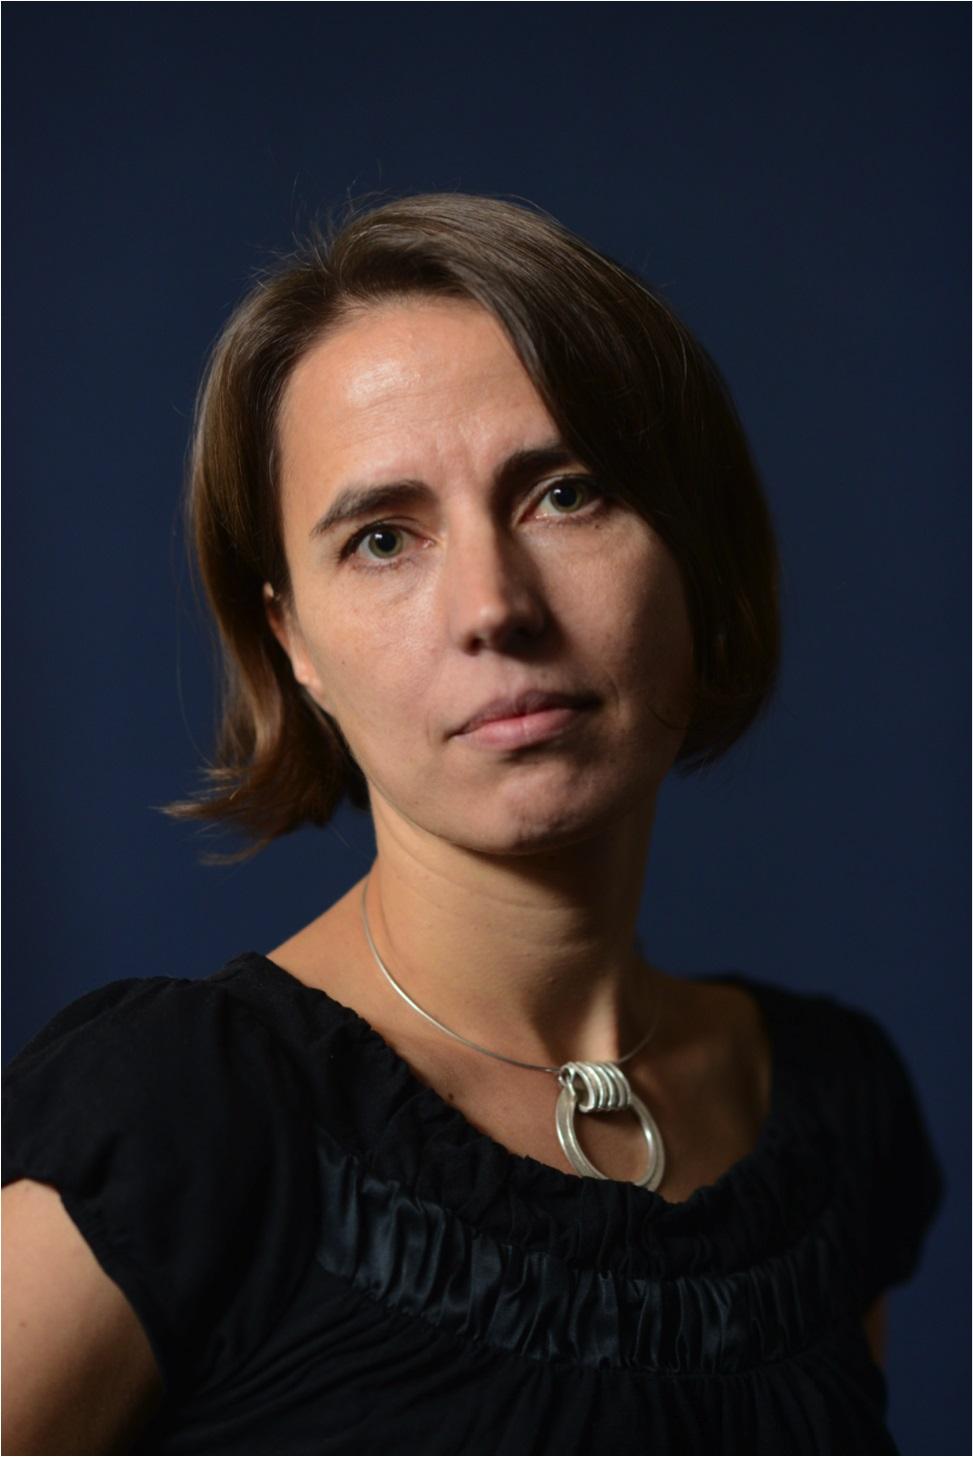 Kati Heinonen